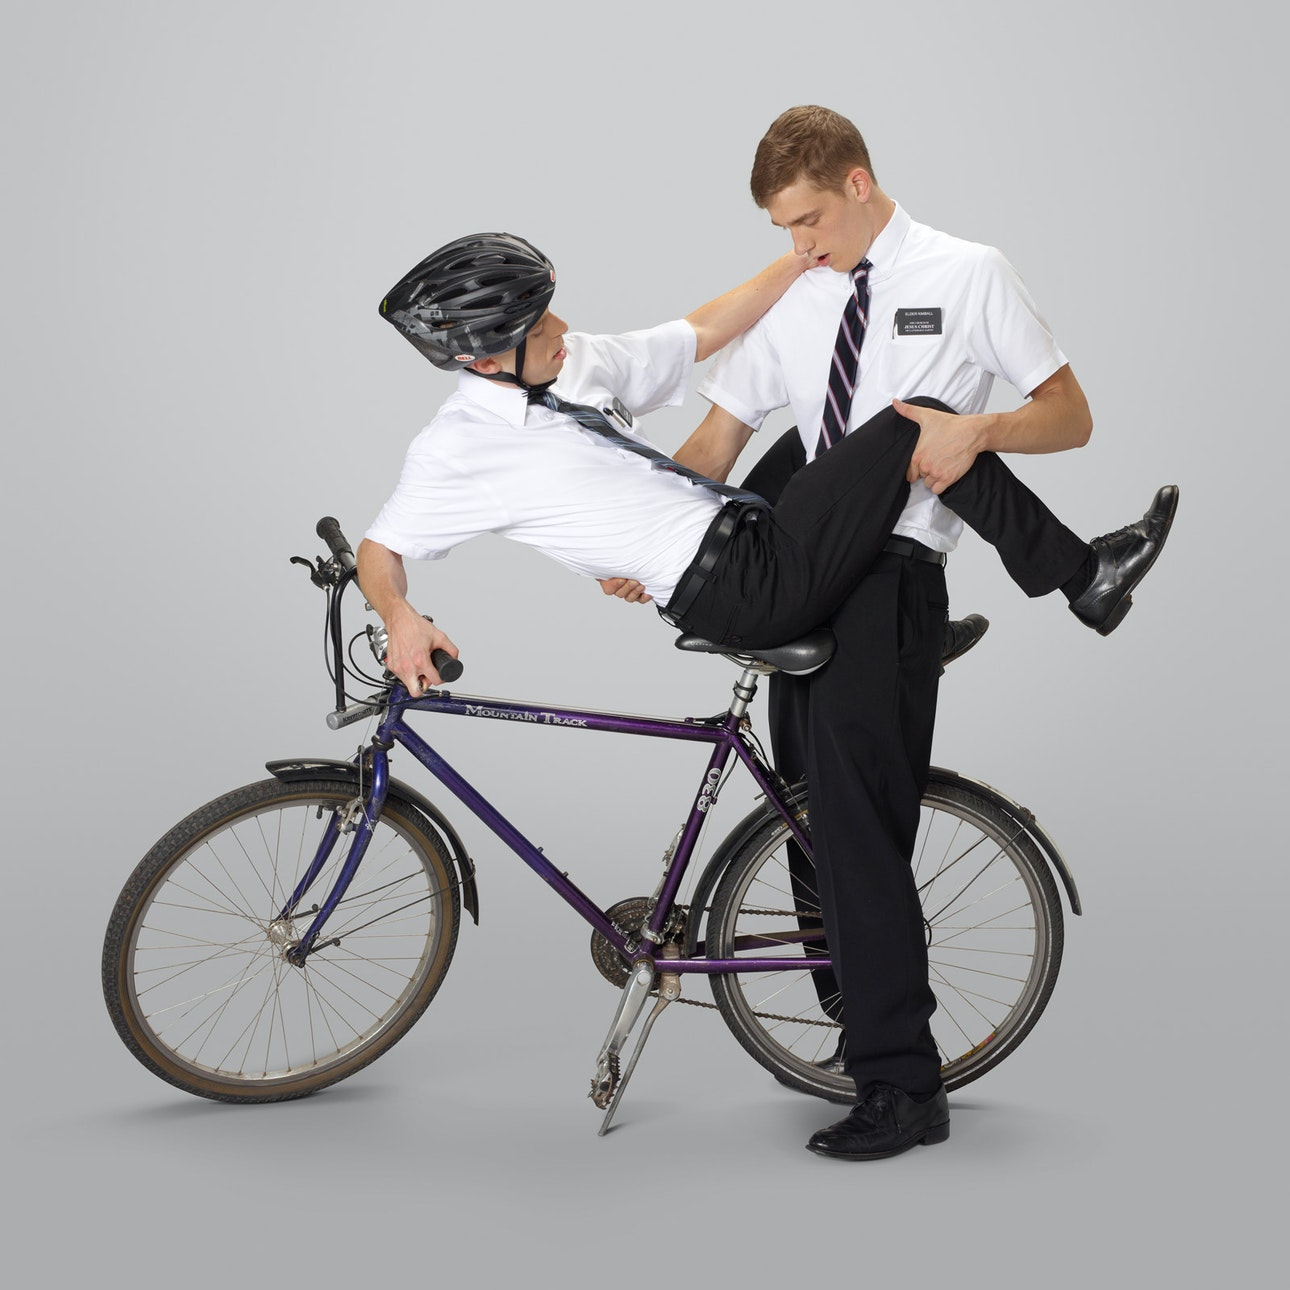 Dacosta_Mormons 17